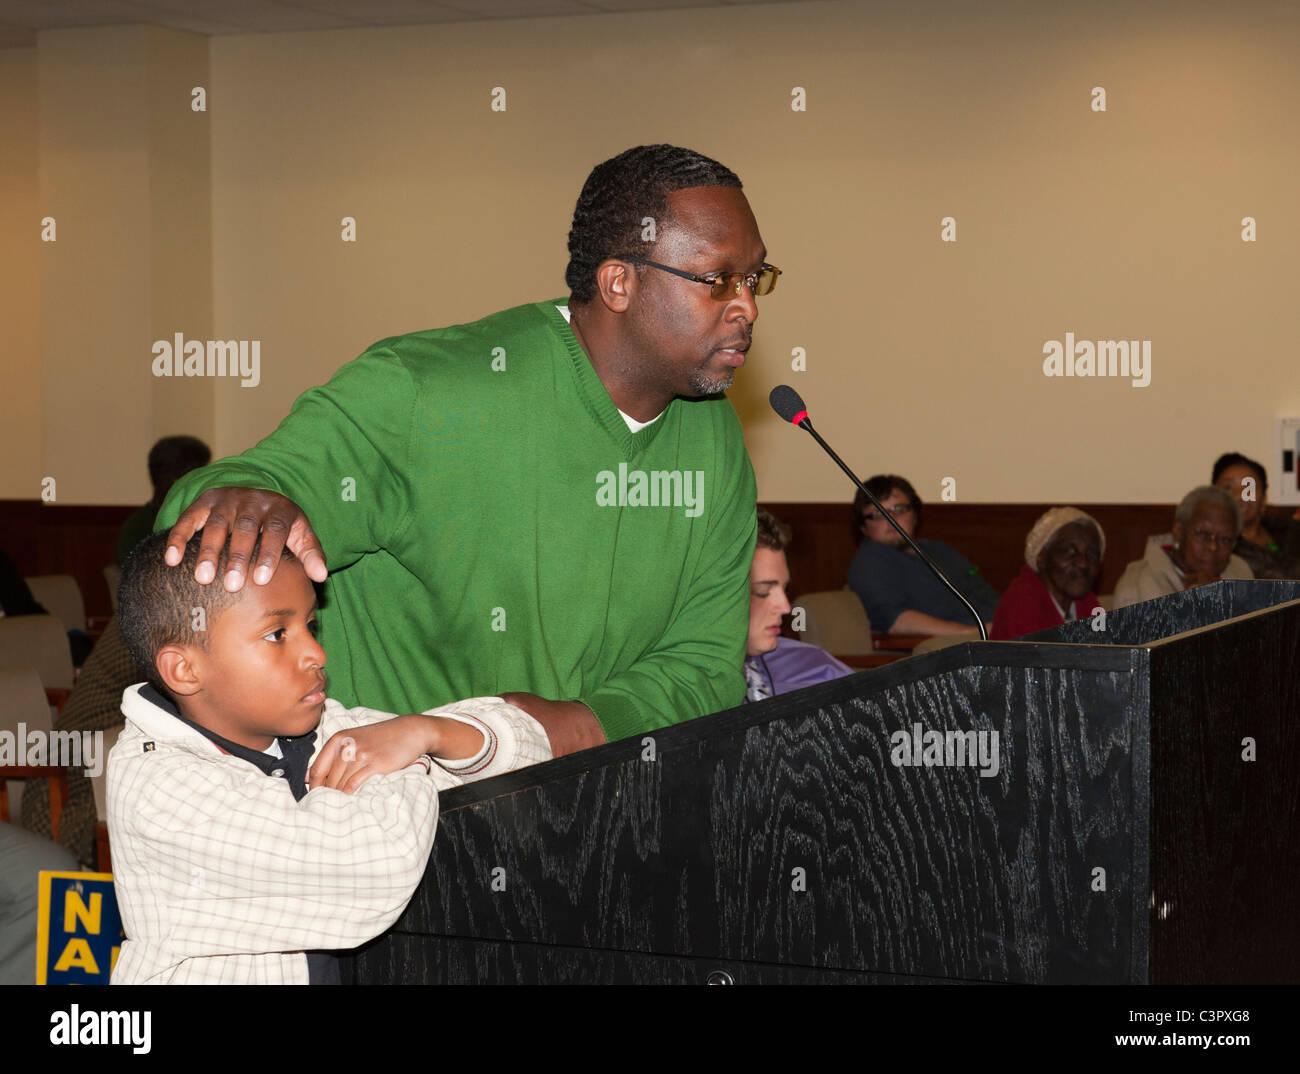 Ramel Smith speaking, hand on son's head, at Nassau County Legislative Redistricting Public Hearing, May 9, - Stock Image